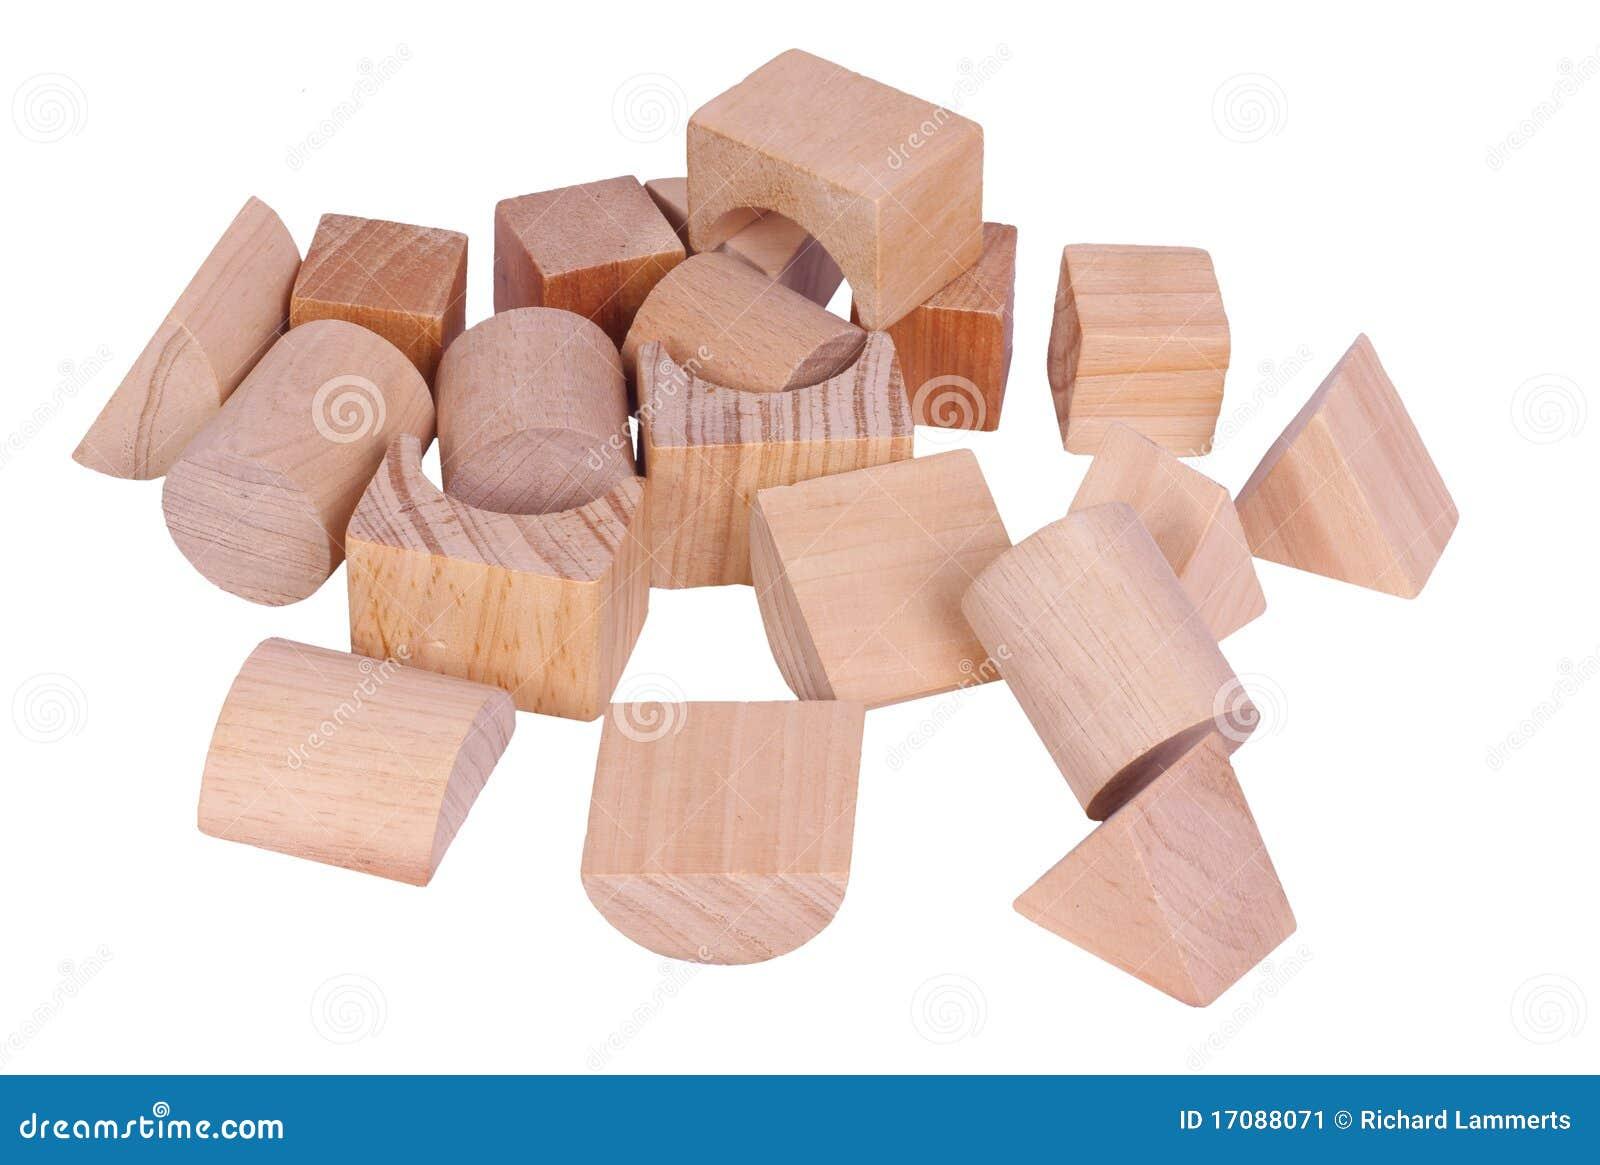 Plan Toys Wooden Building Blocks